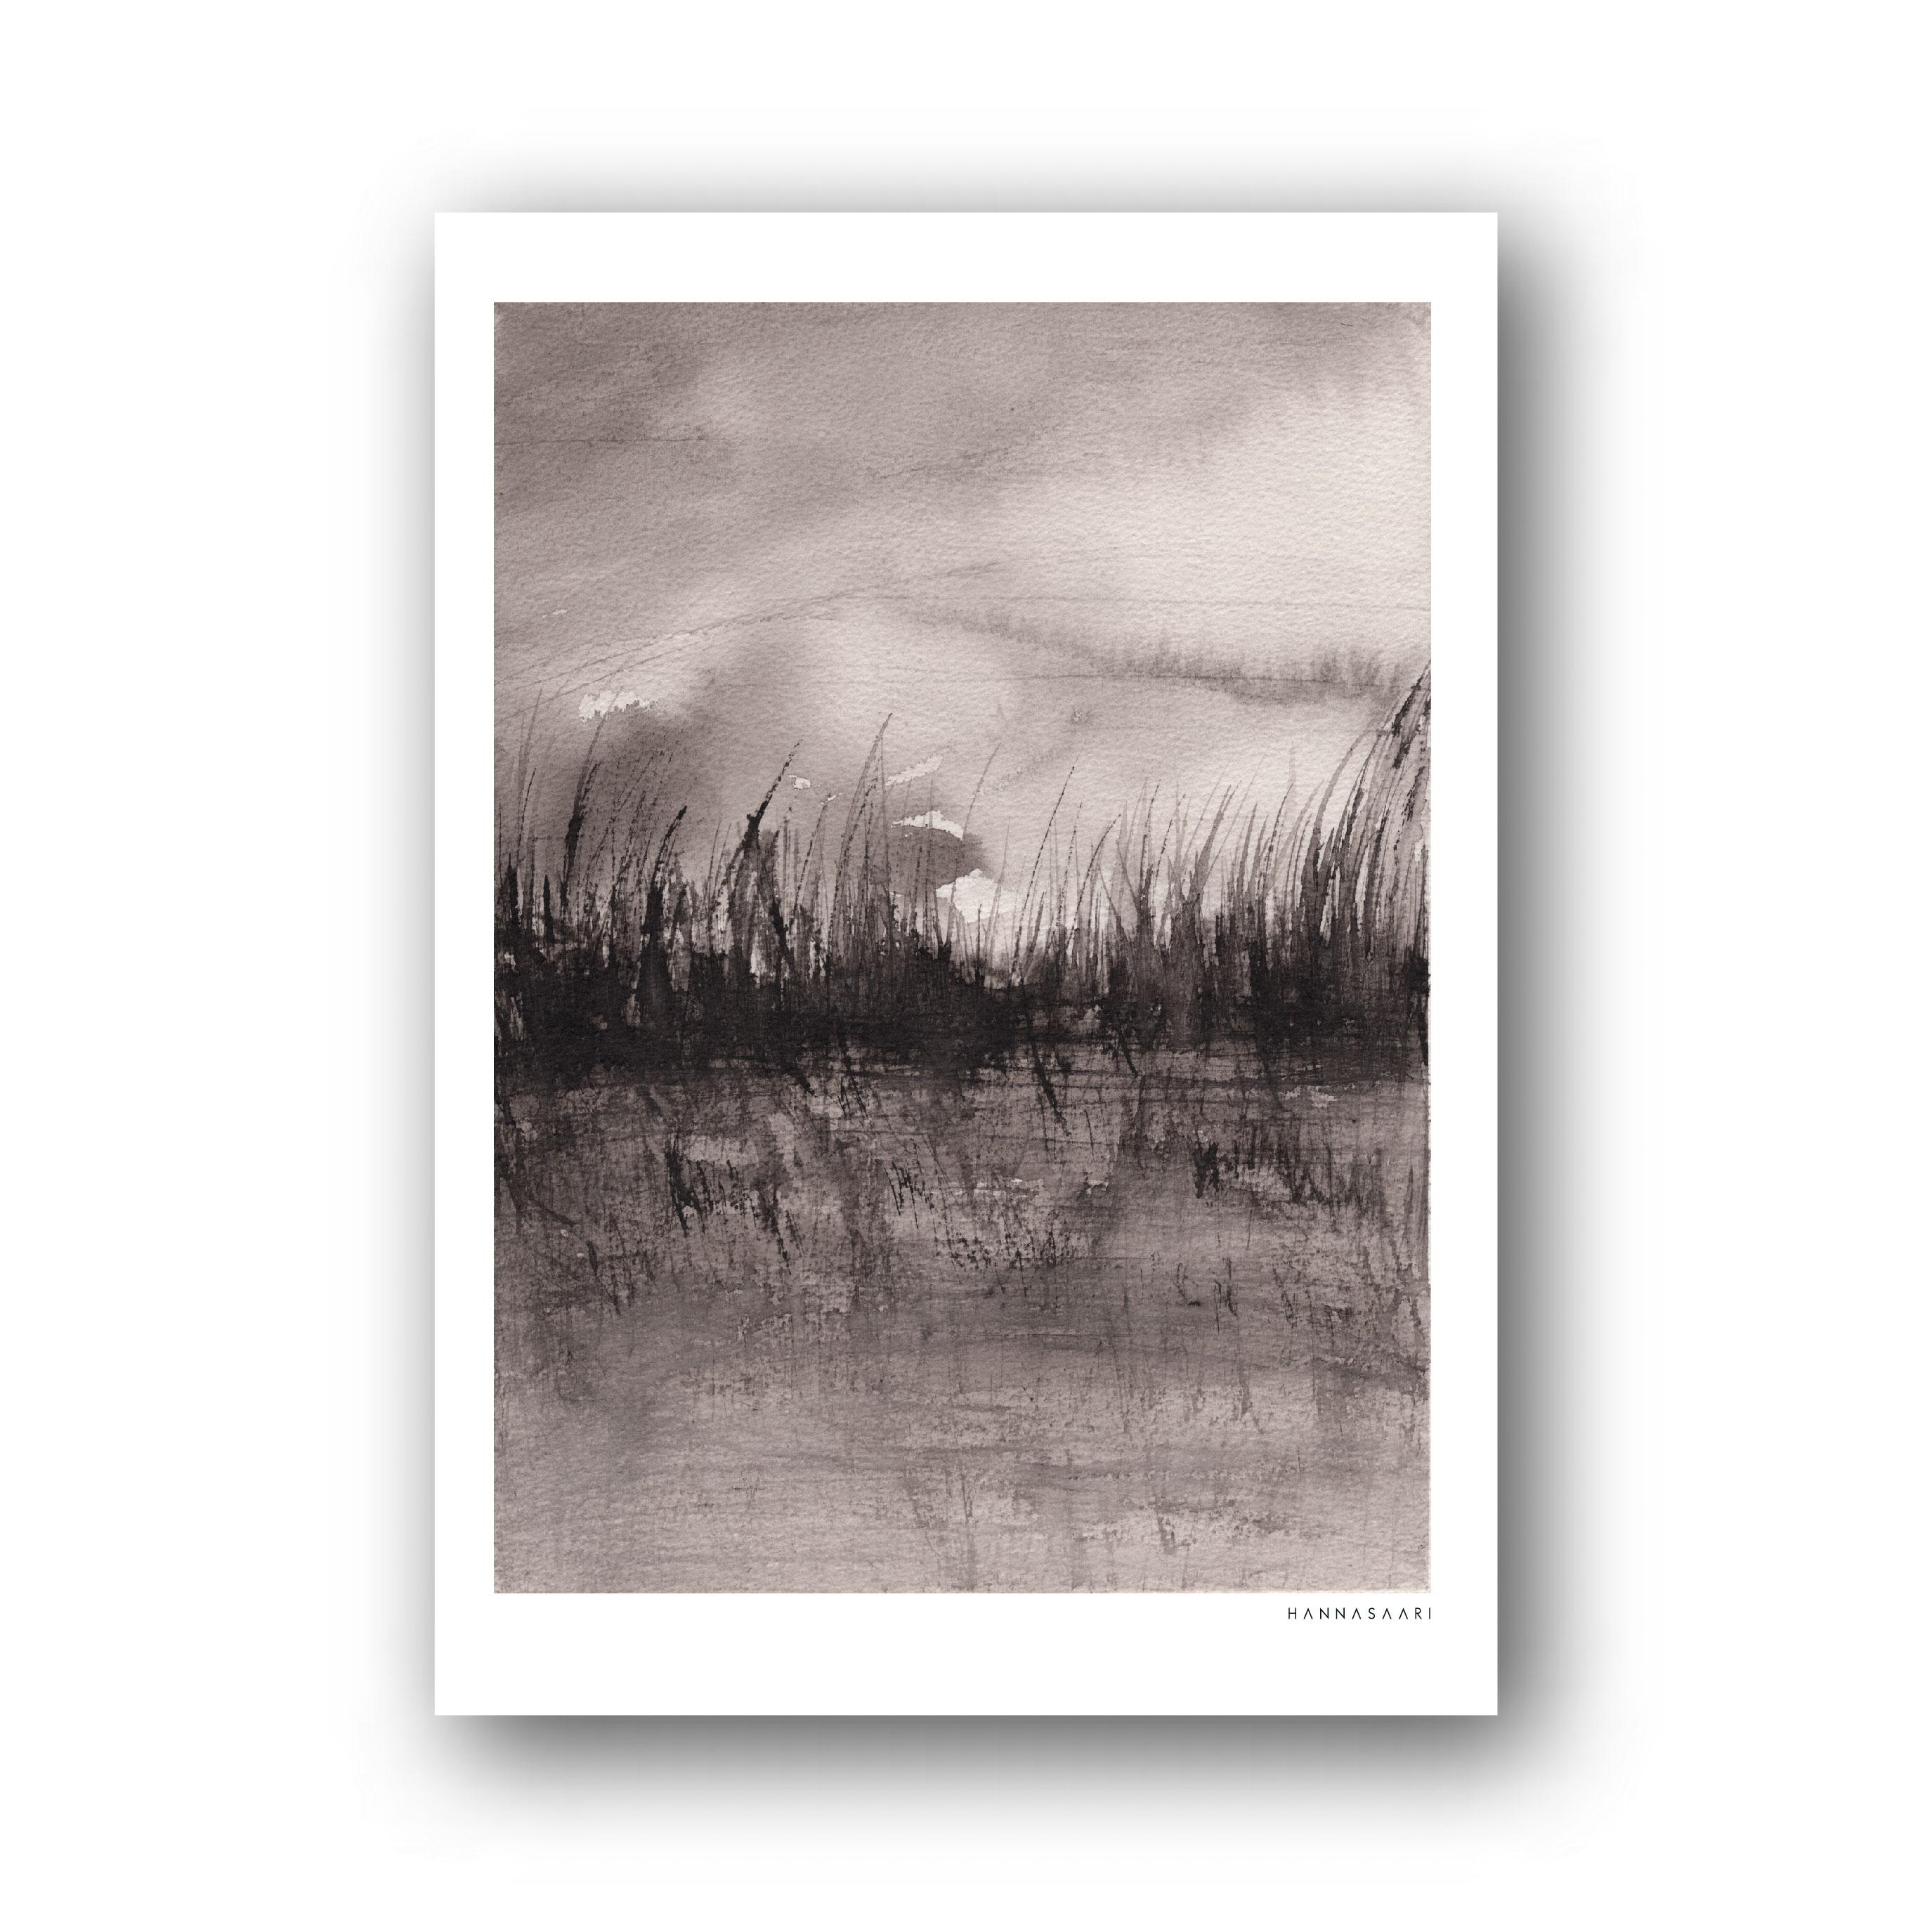 halikonlahti kortti-poster A4